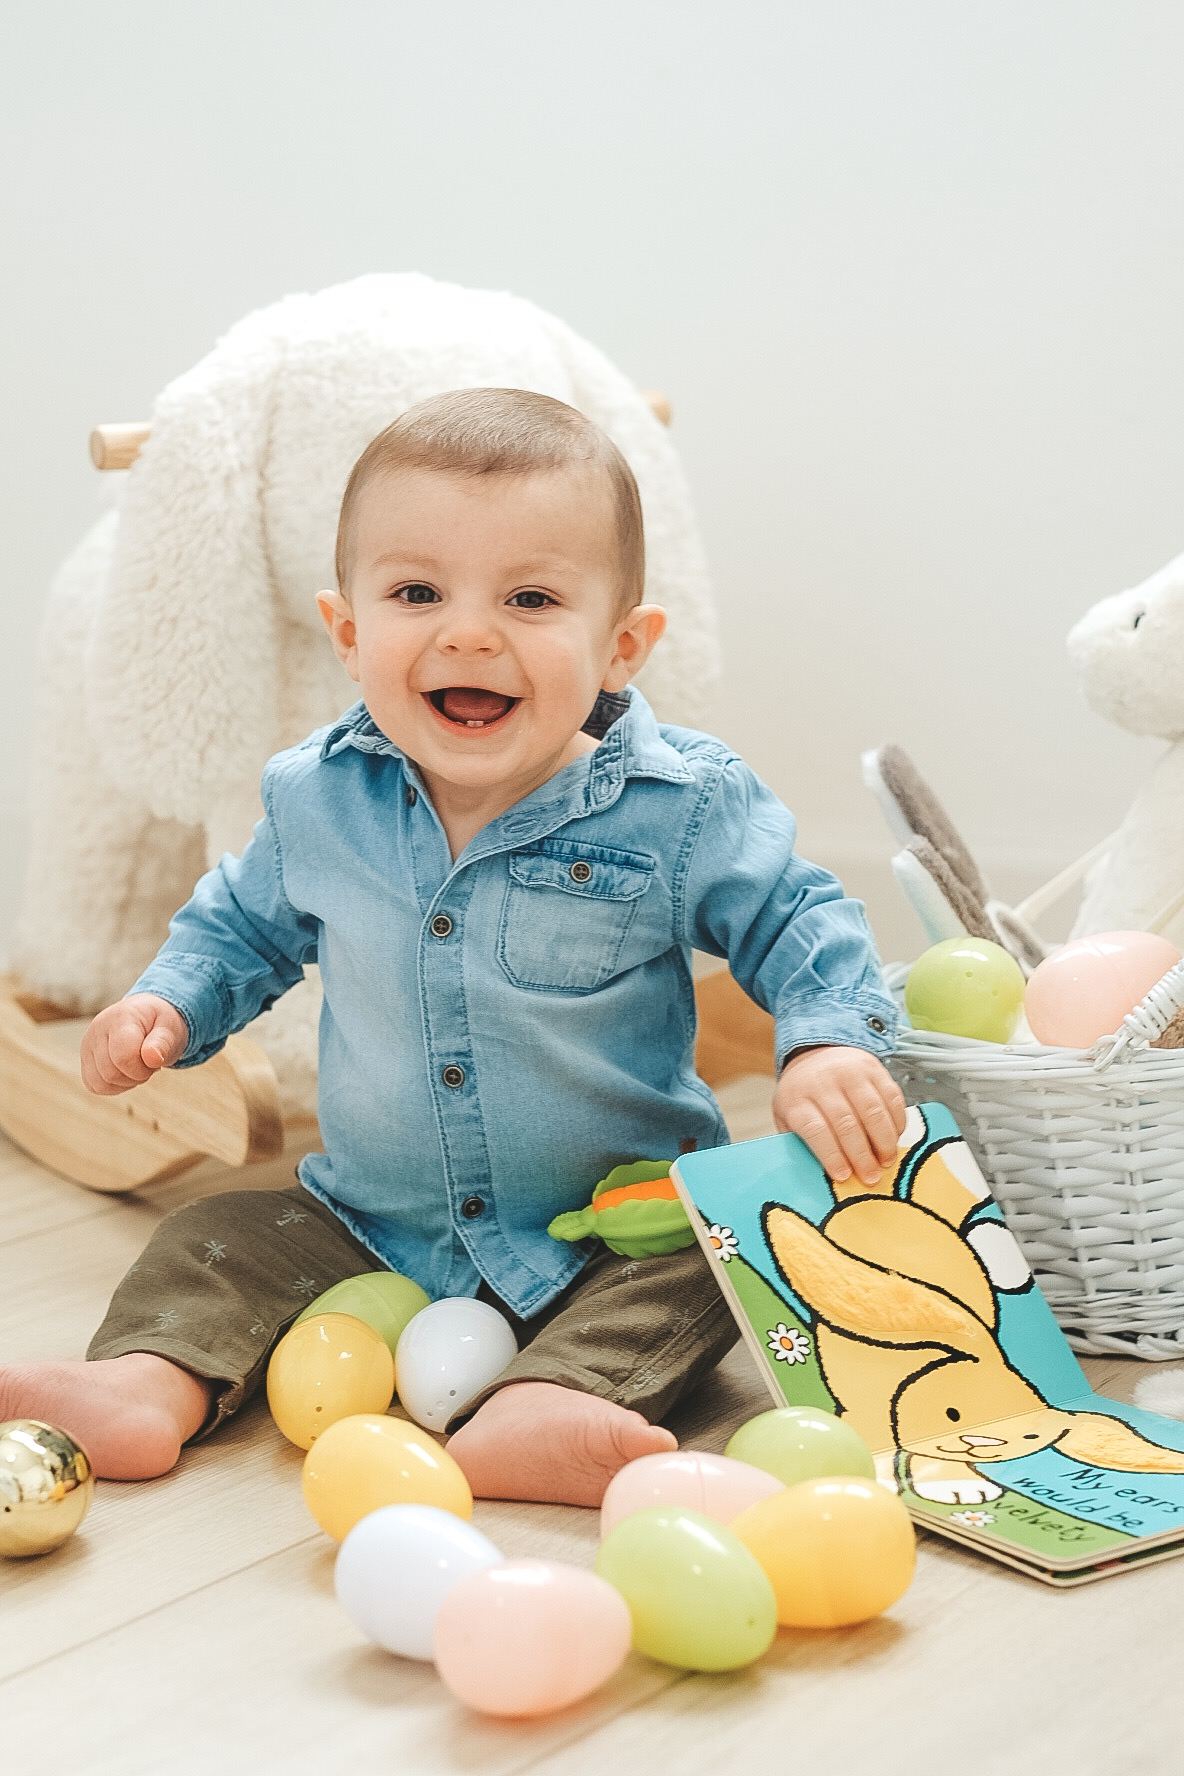 Easter Basket Ideas For Babies Under 1 Me And Mr Jones